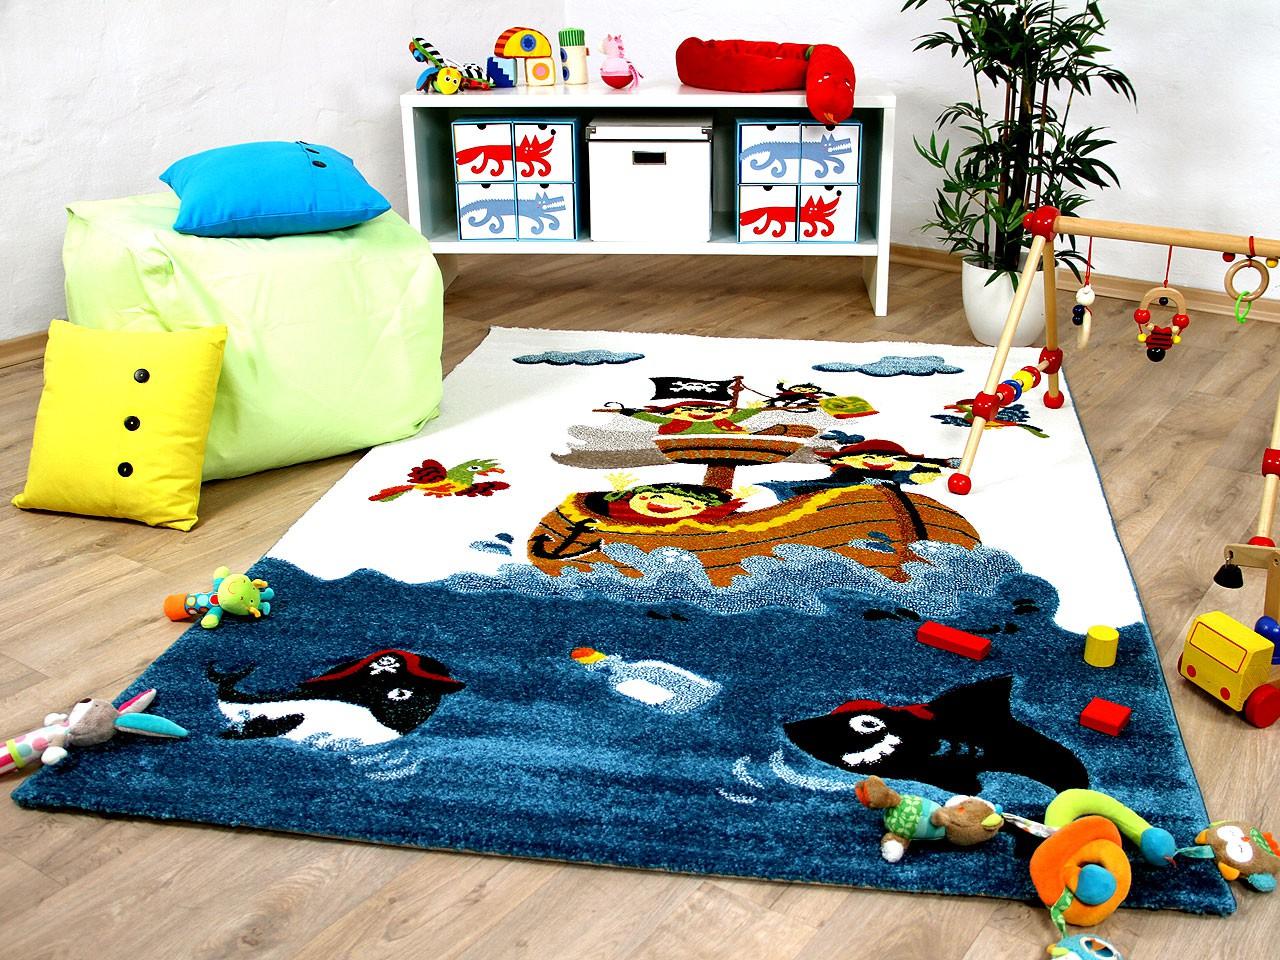 kinder teppich maui kids piratenschiff teppiche kinder und spielteppiche maui kinderteppiche. Black Bedroom Furniture Sets. Home Design Ideas